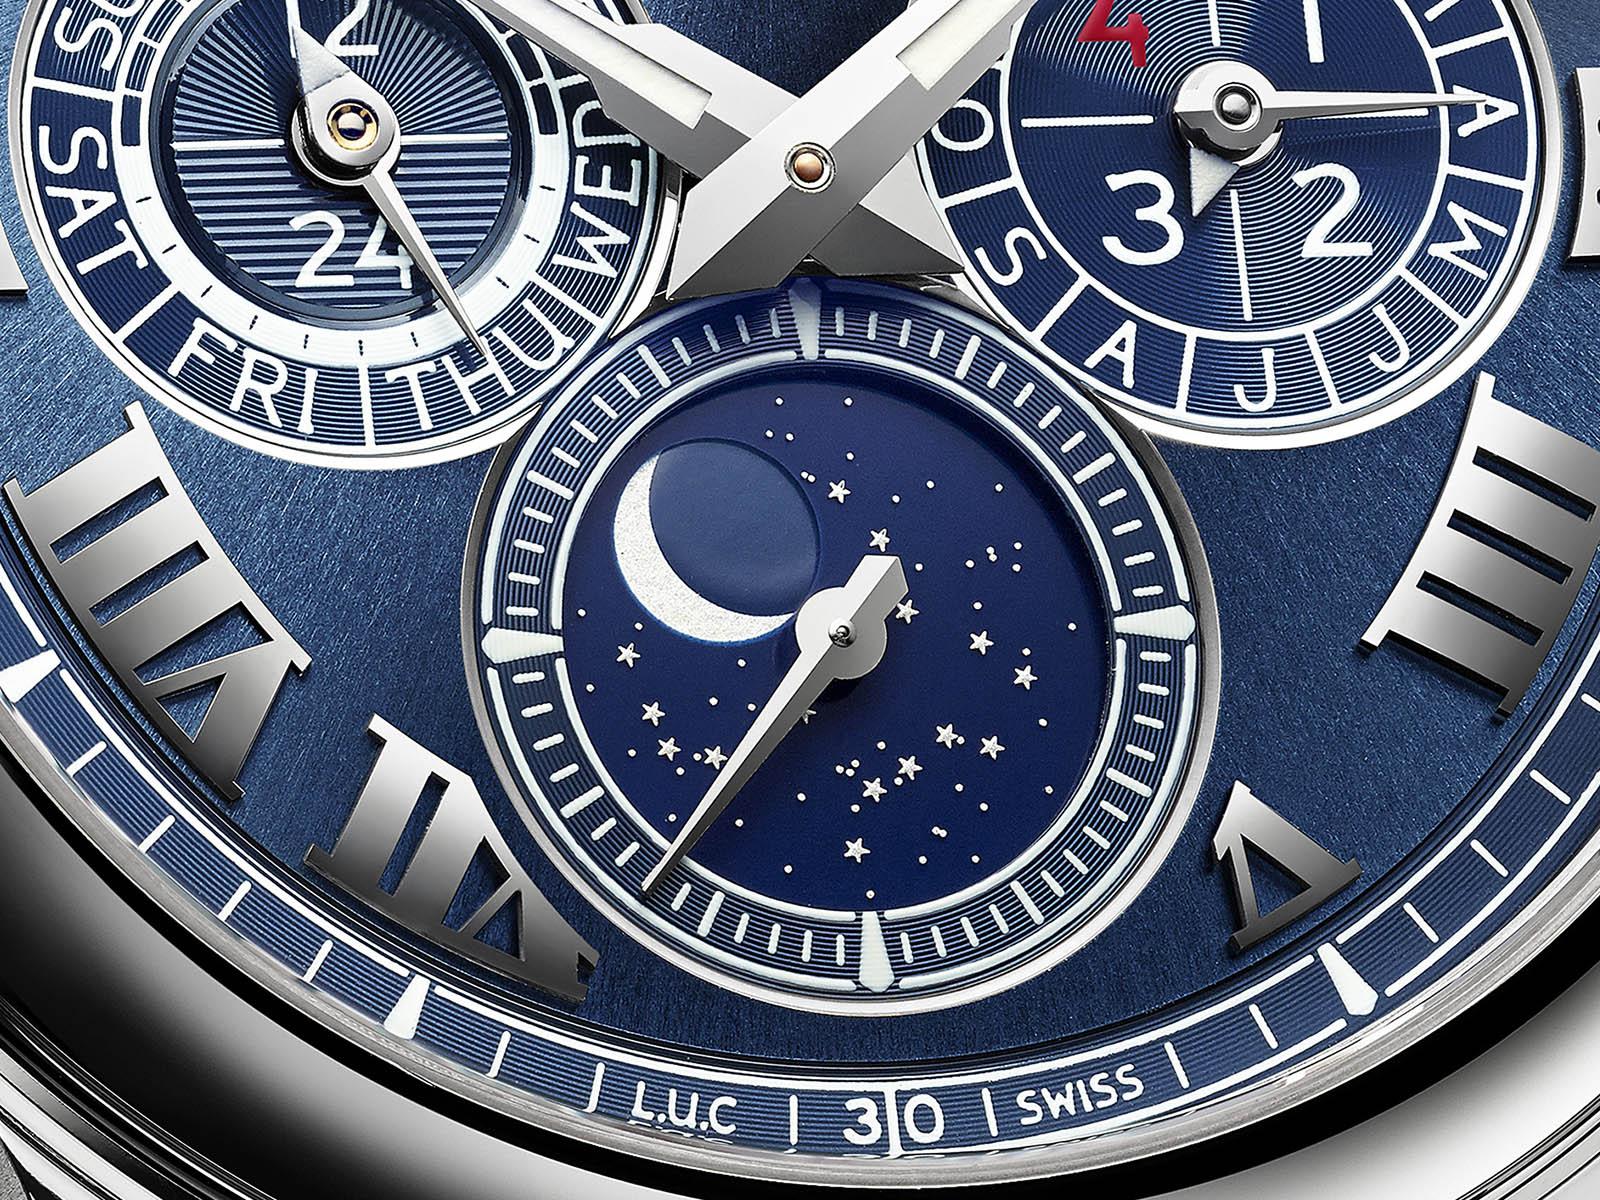 Chopard-L-U-C-Lunar-One-Platinum-Royal-Blue-perpetual-calendar-10.jpg